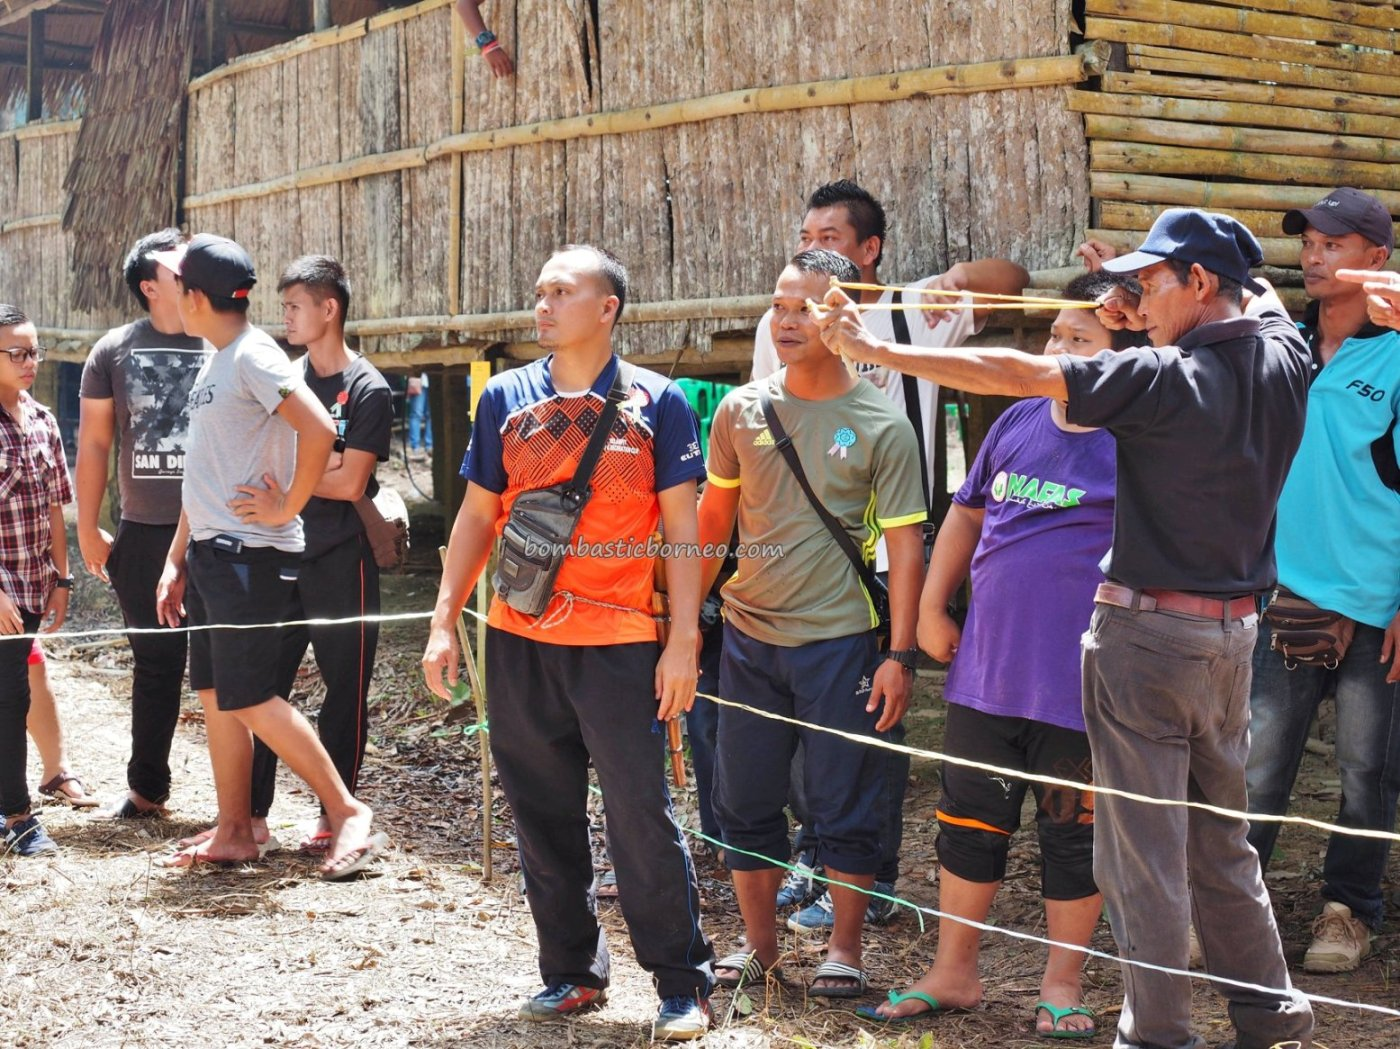 Selampit village, Gawai Harvest Festival, traditional, indigenous, event, Borneo, Lundu, Kuching, Sarawak, Malaysia, tribe, Dayak Bidayuh, native, Tourism, travel guide,